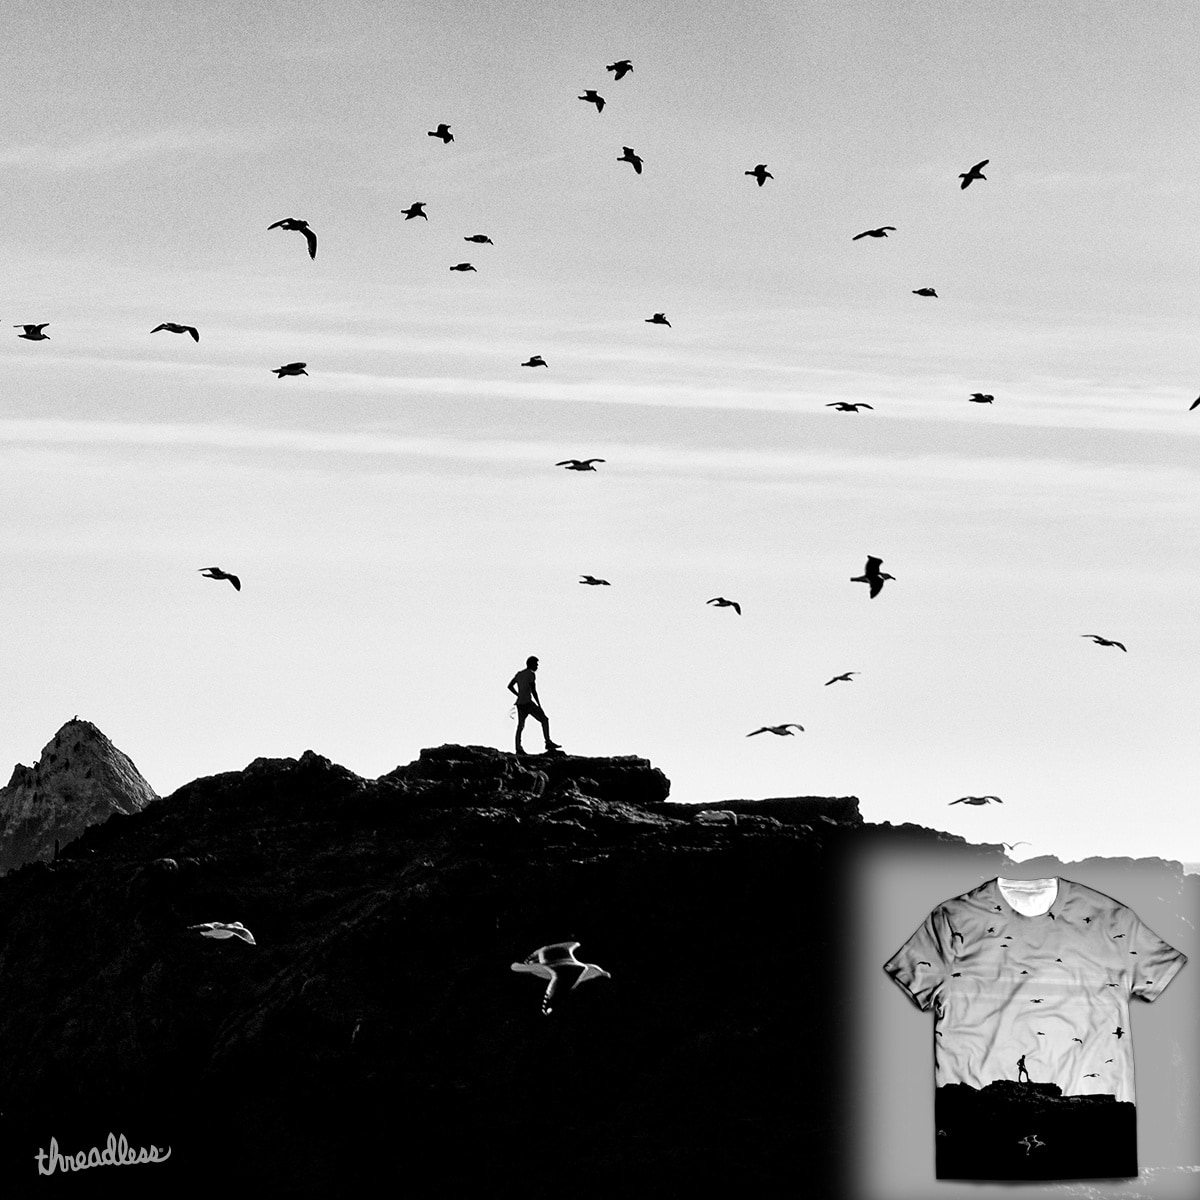 Flock of Seagulls by recasper on Threadless